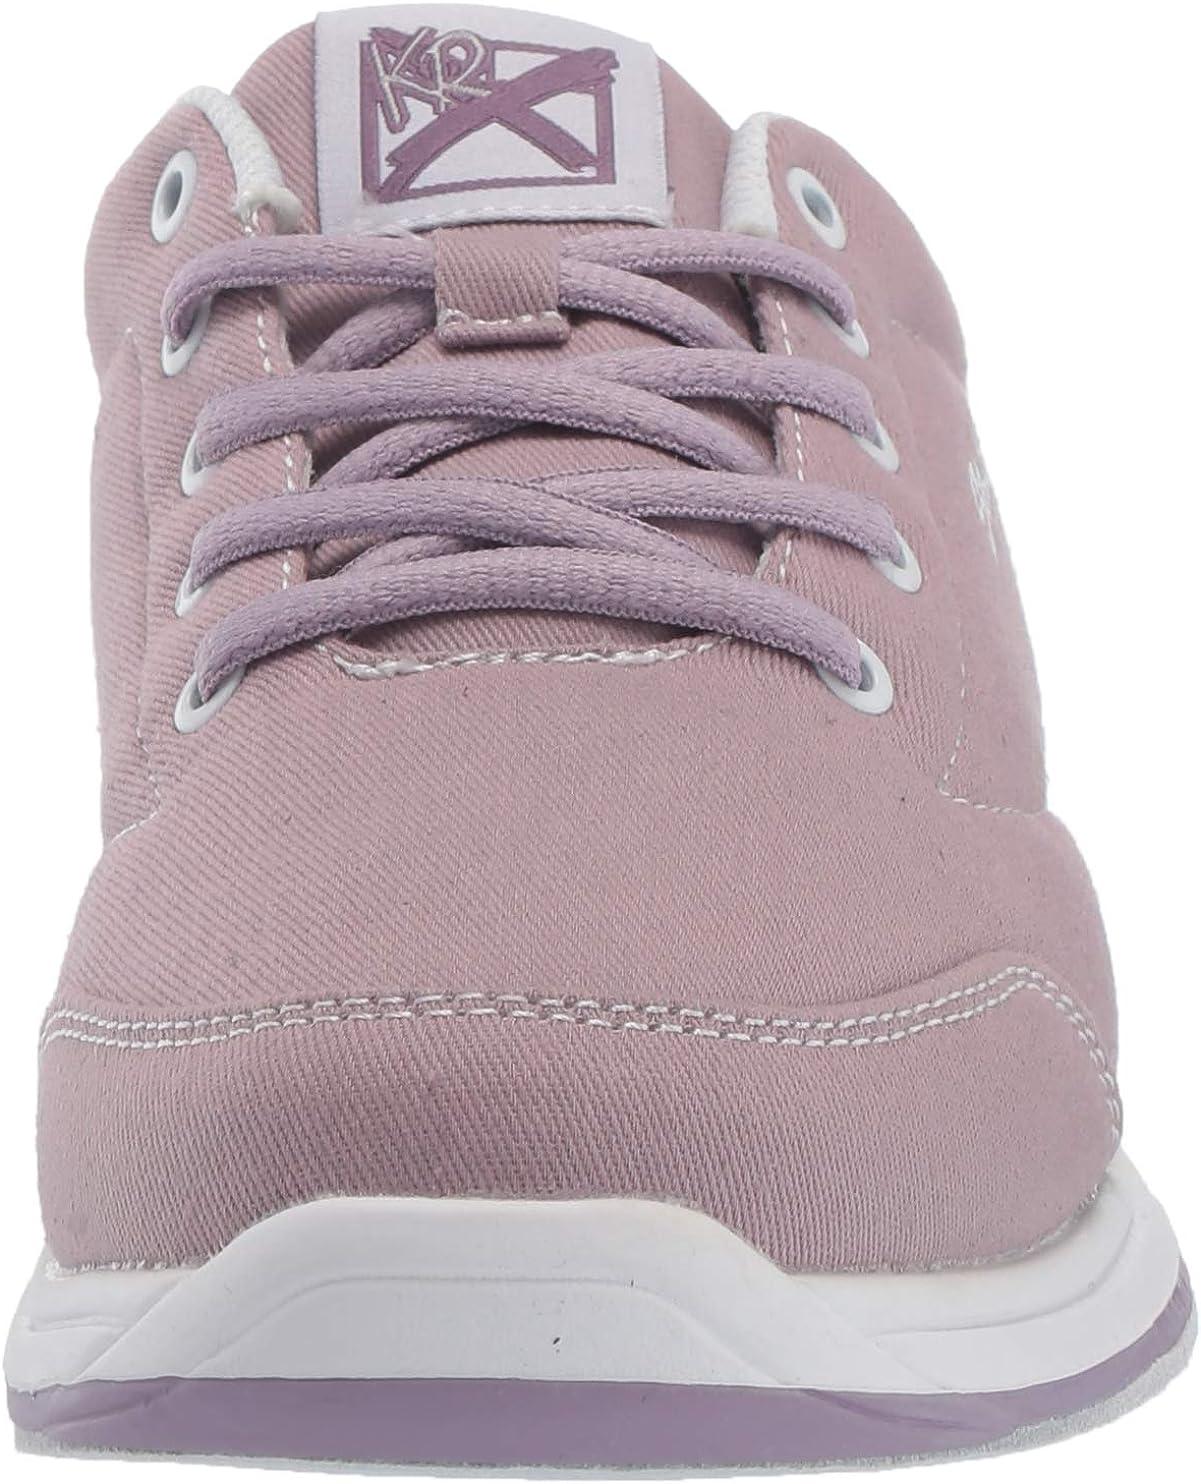 KR Strikeforce Damen Chill Bowling Schuhe